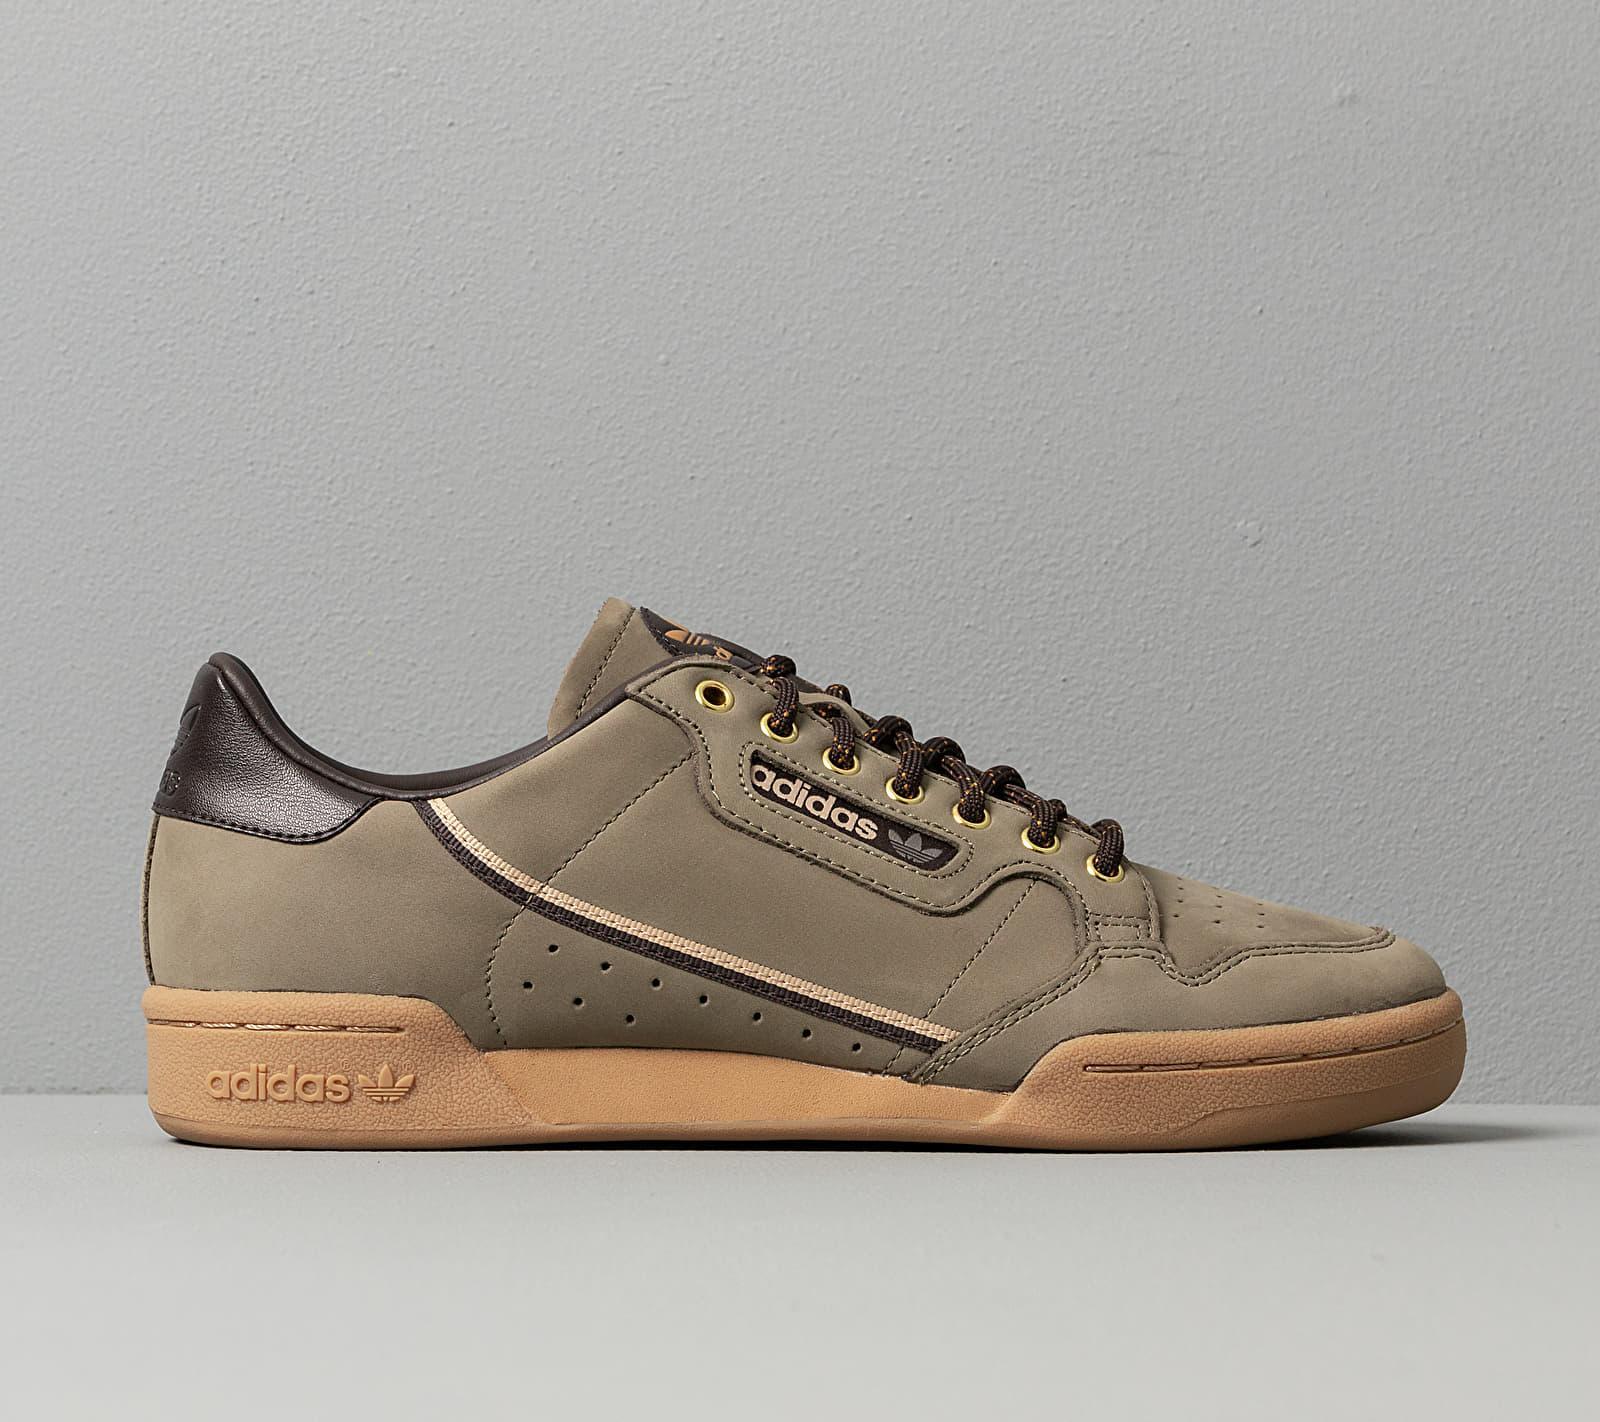 adidas Originals Adidas Continental 80 Trace Cargo/ Mesa/ Night ...